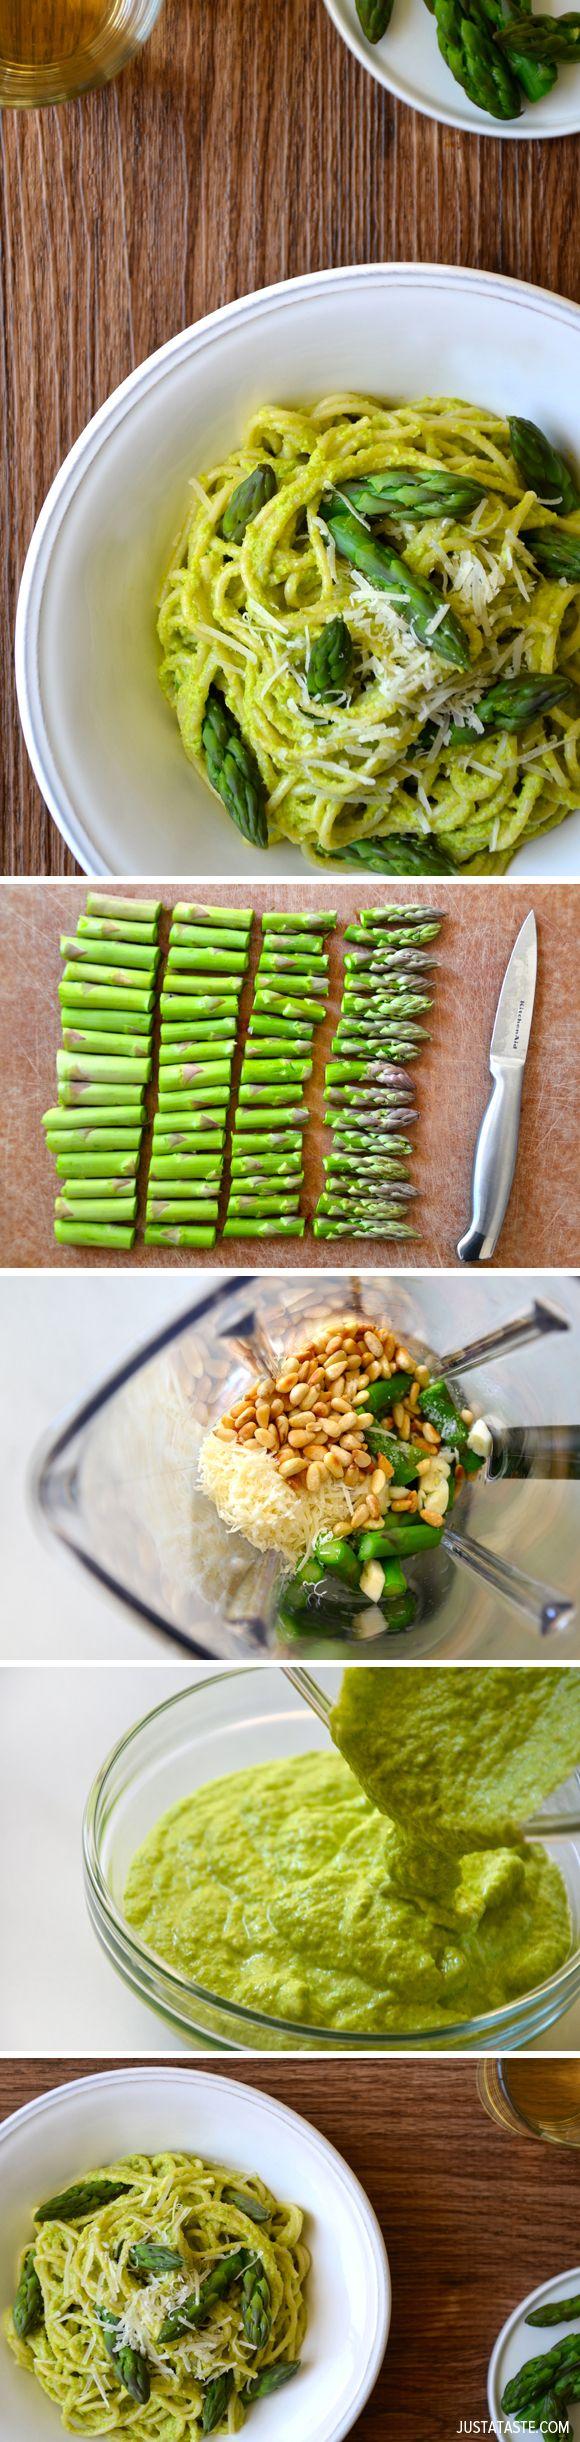 Cheesy Asparagus Pesto Pasta | Recipe